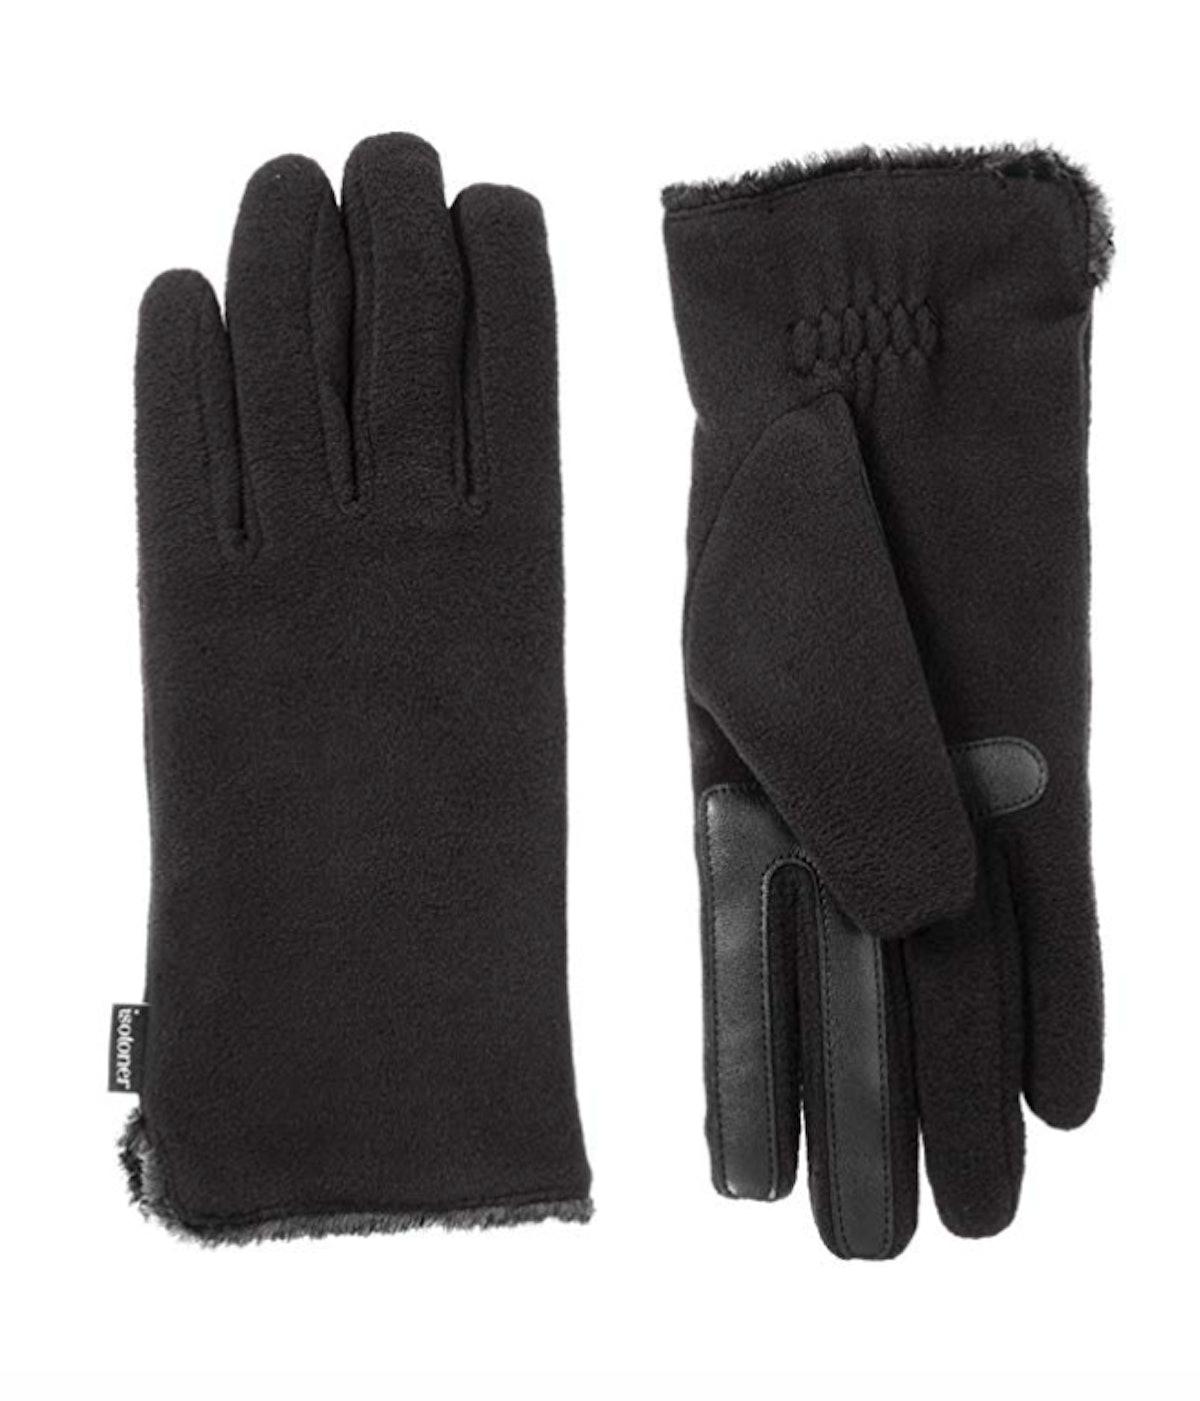 Isotoner Women's Stretch Fleece Touchscreen Gloves